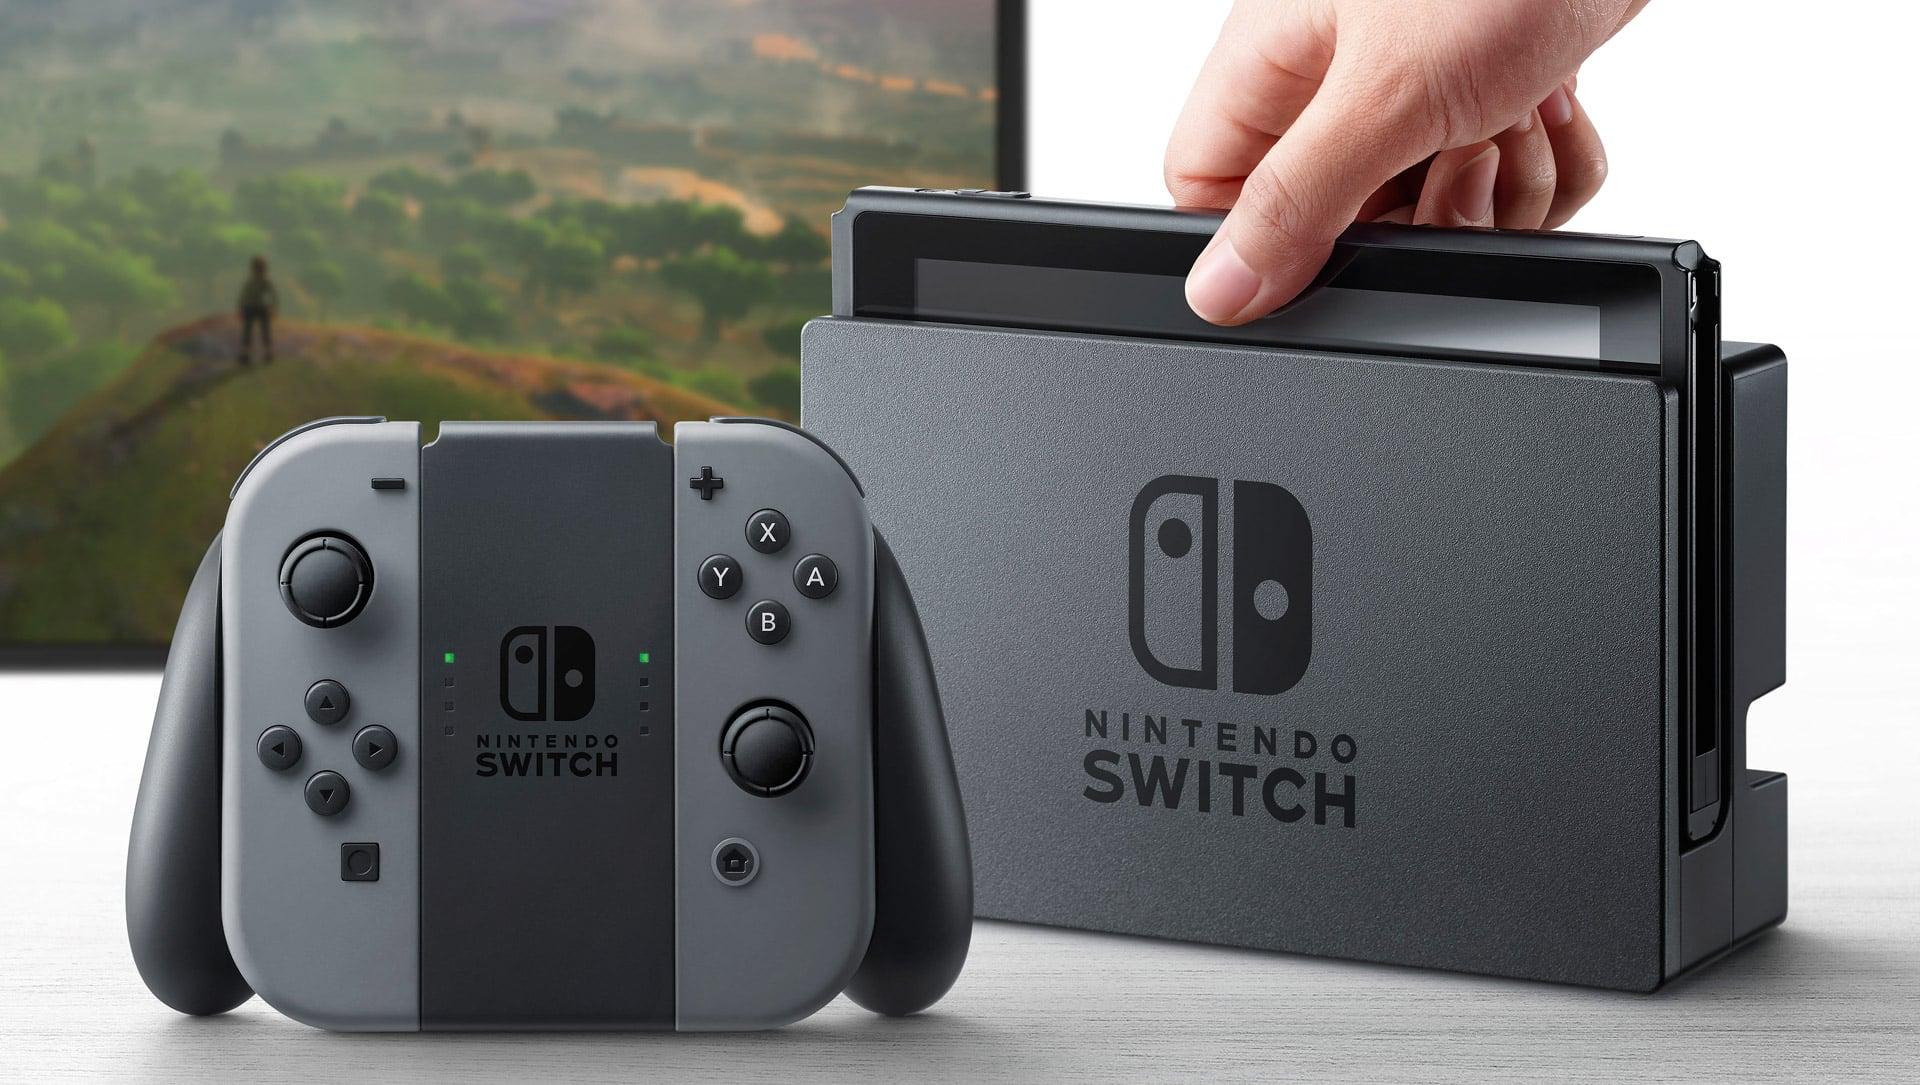 Nintendo-Switch 5 أسباب لشراء منصة الألعاب المحمولة نينتندو Nintendo Switch